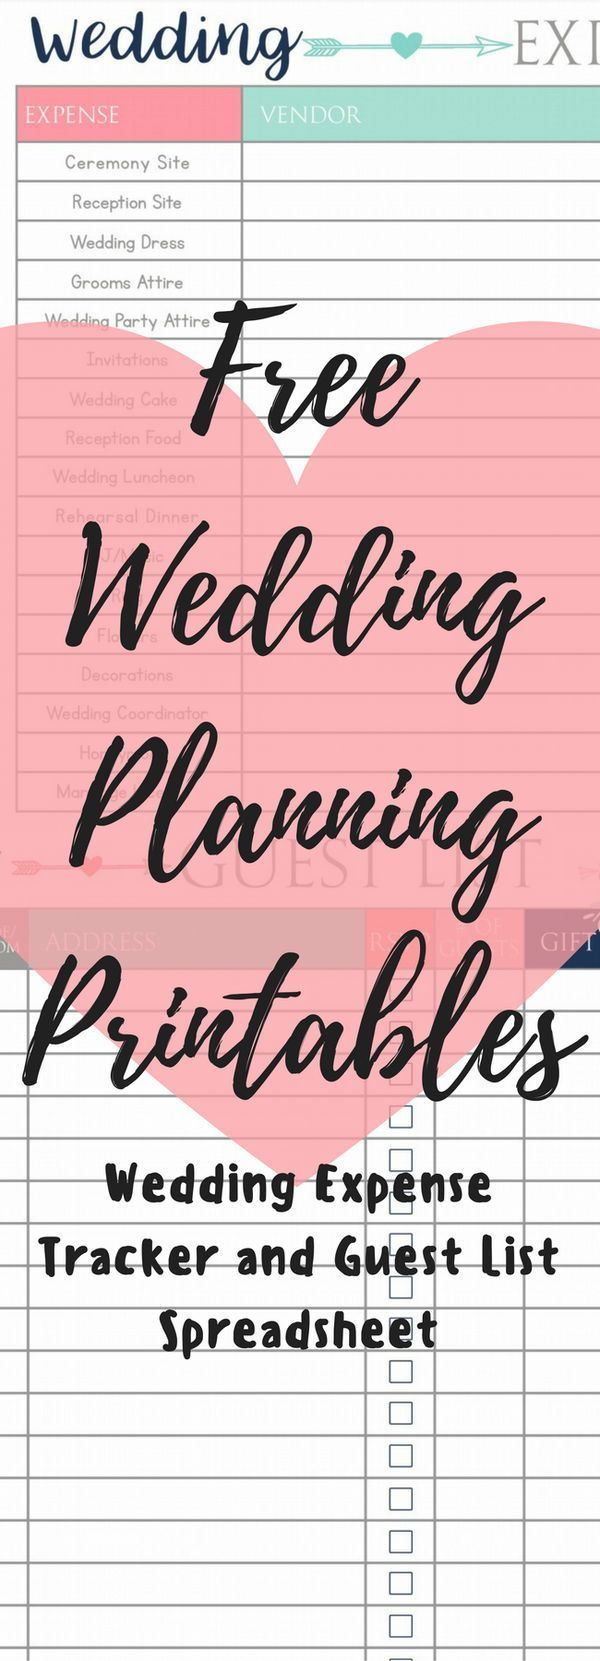 Wedding Budget planning printables